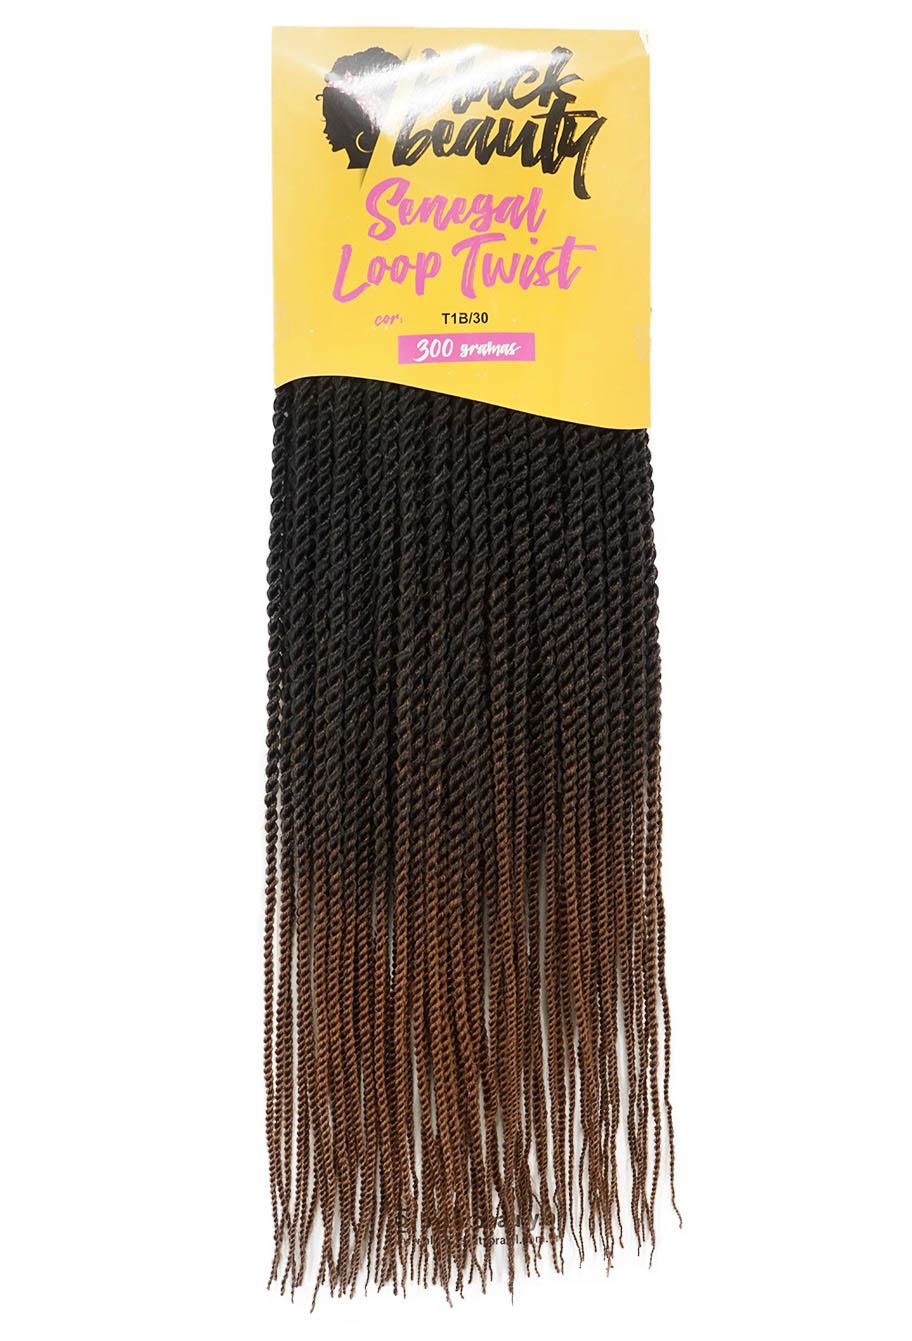 Cabelo Sintético - Black Beauty - Senegal Loop Twist